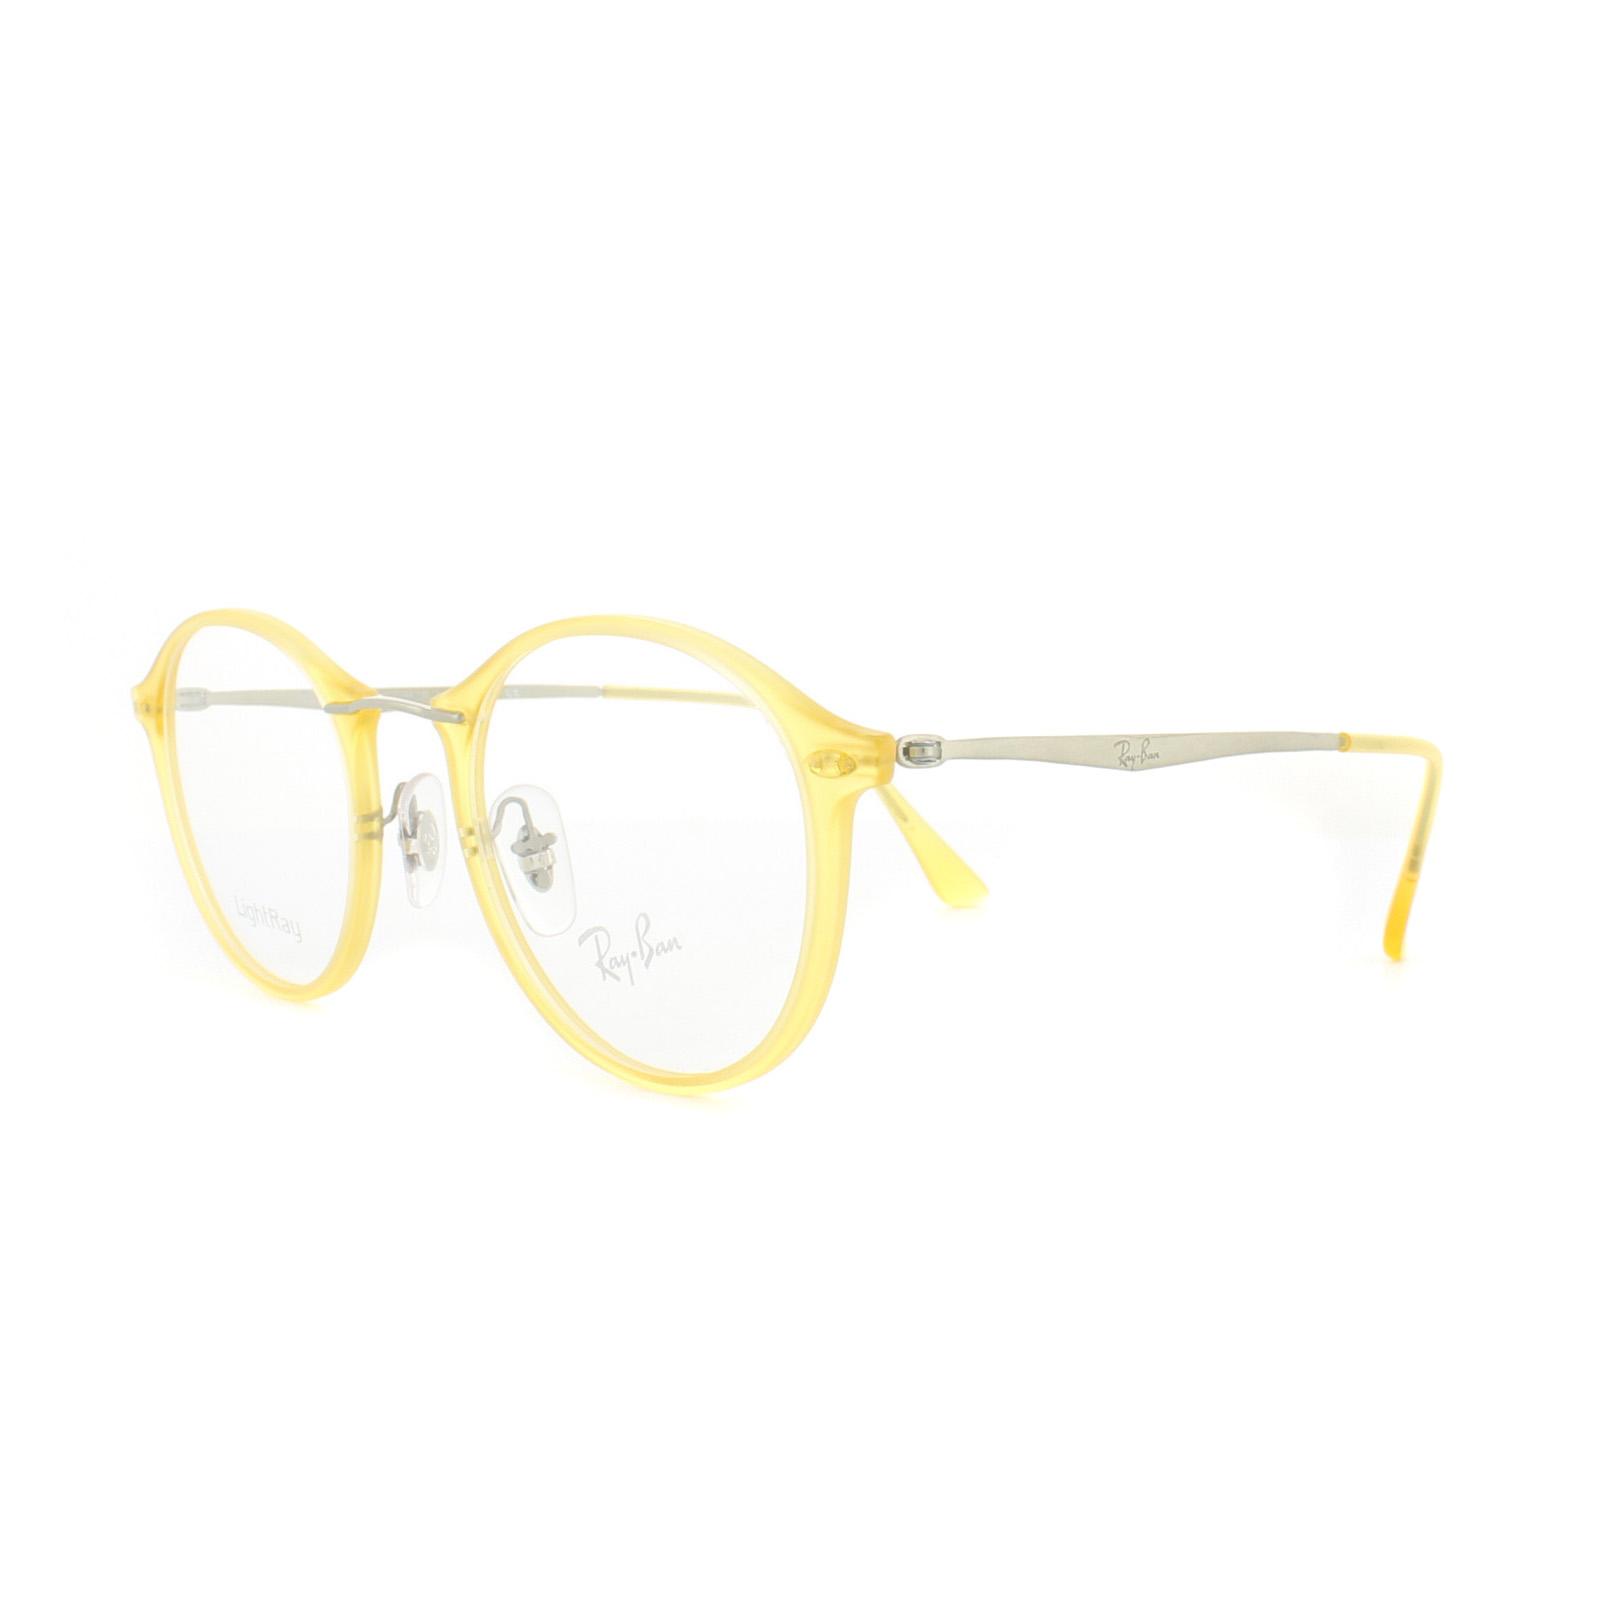 8f7391a31d36fe Sentinel Ray-Ban Glasses Frames RX 7073 5589 Matt Crystal Yellow Mens  Womens 47mm